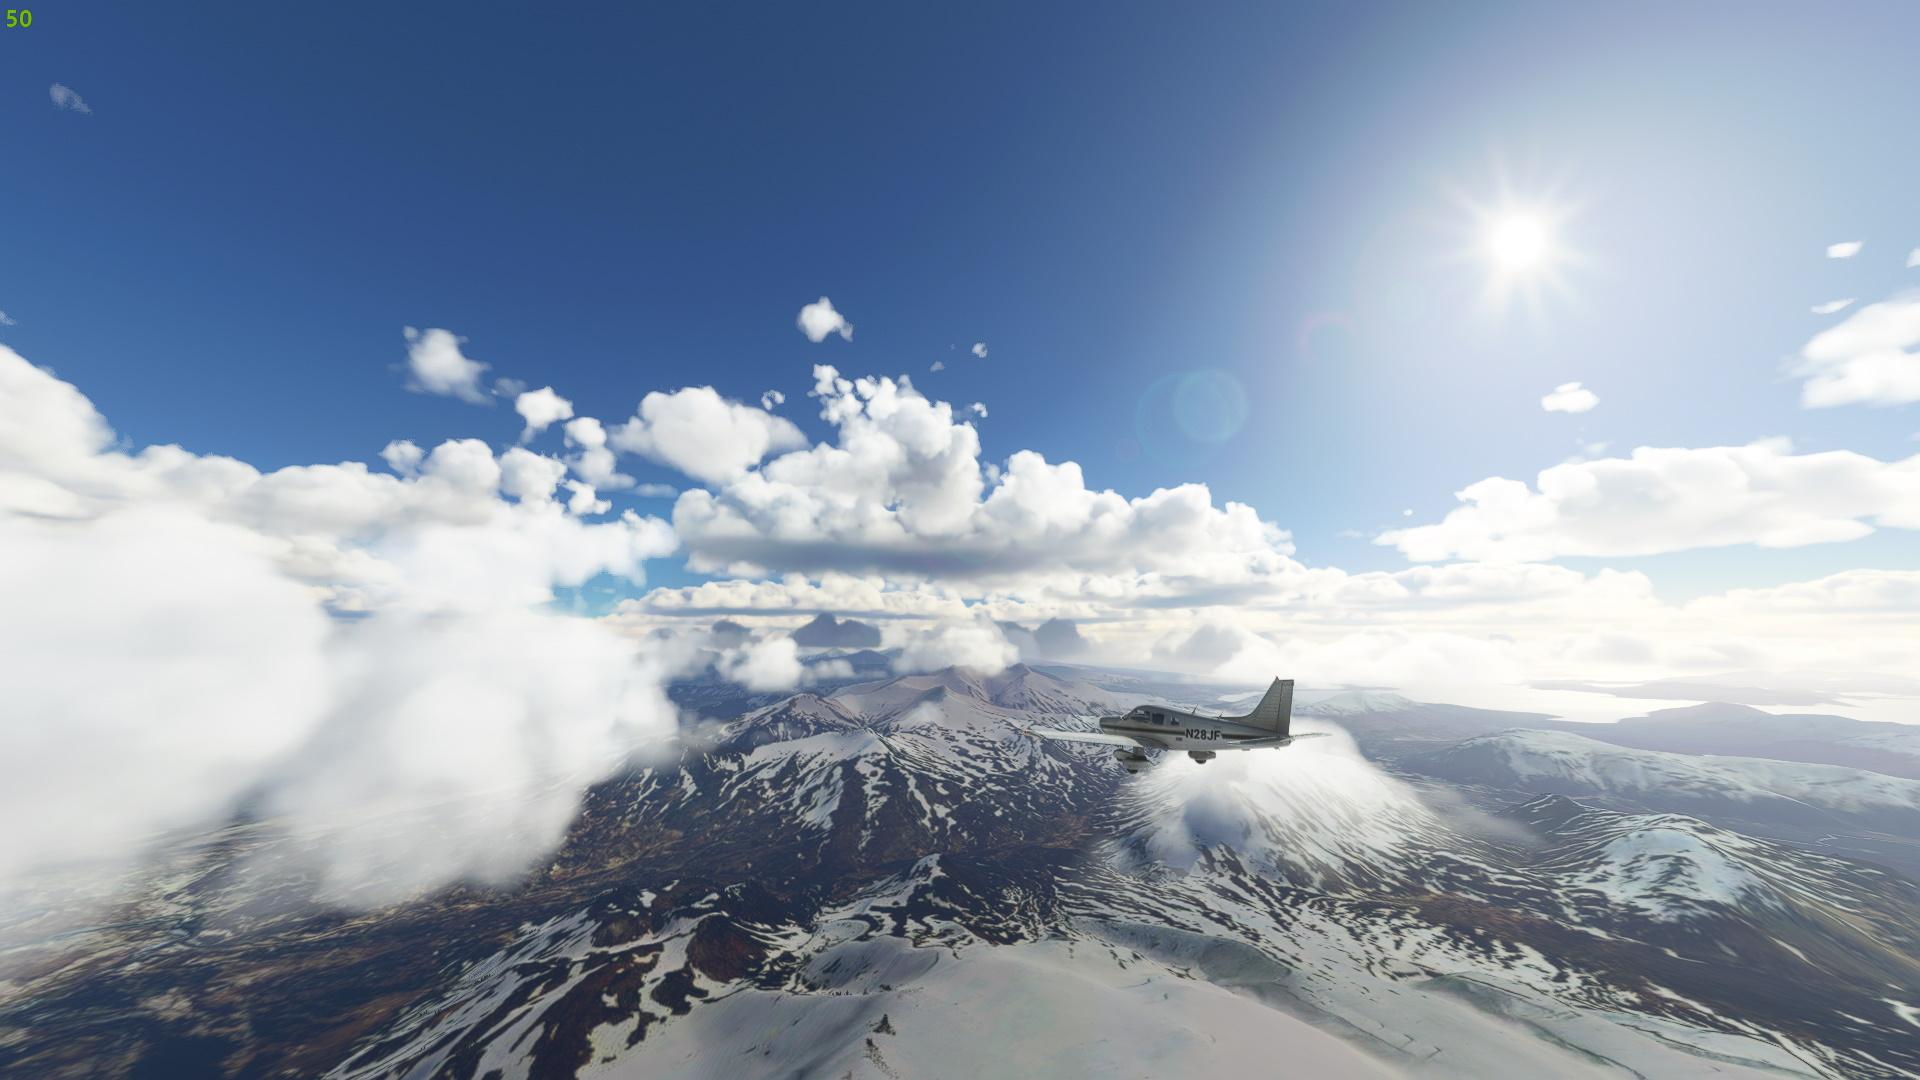 Microsoft Flight Simulator — PC performance sees improvement thanks to Xbox release